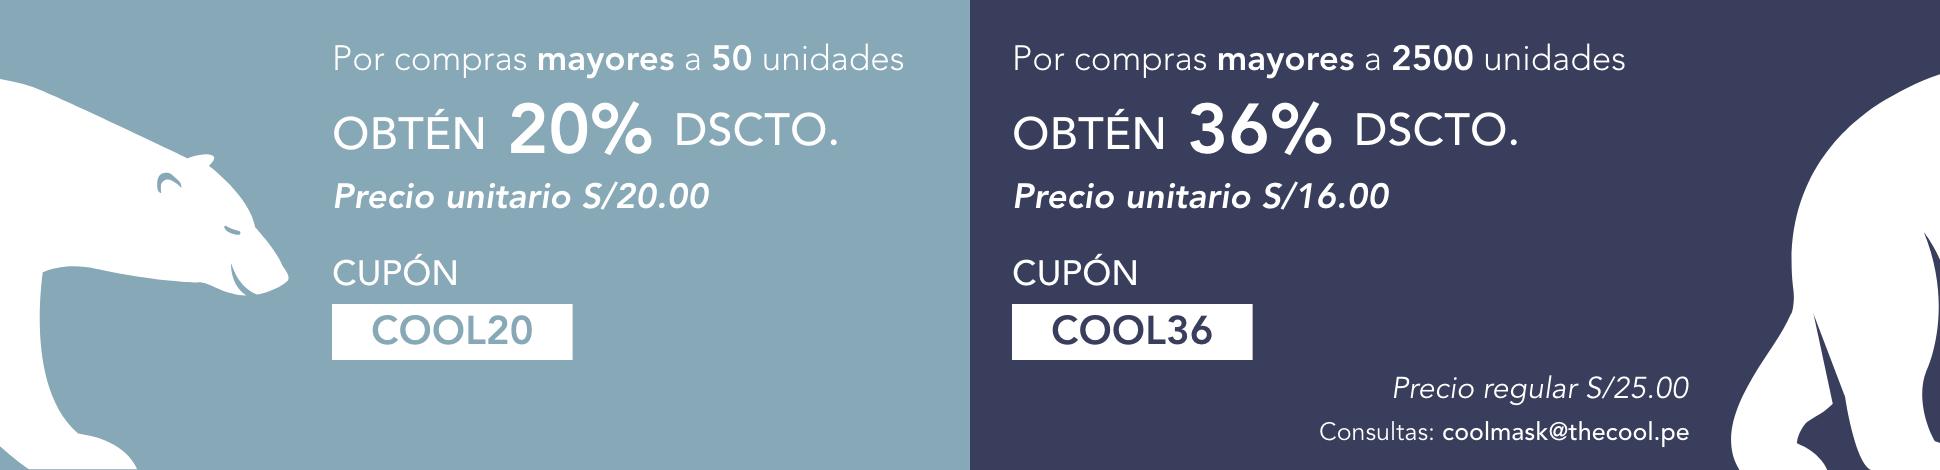 Banner descuentos desktop@2x.png | Juntoz.com